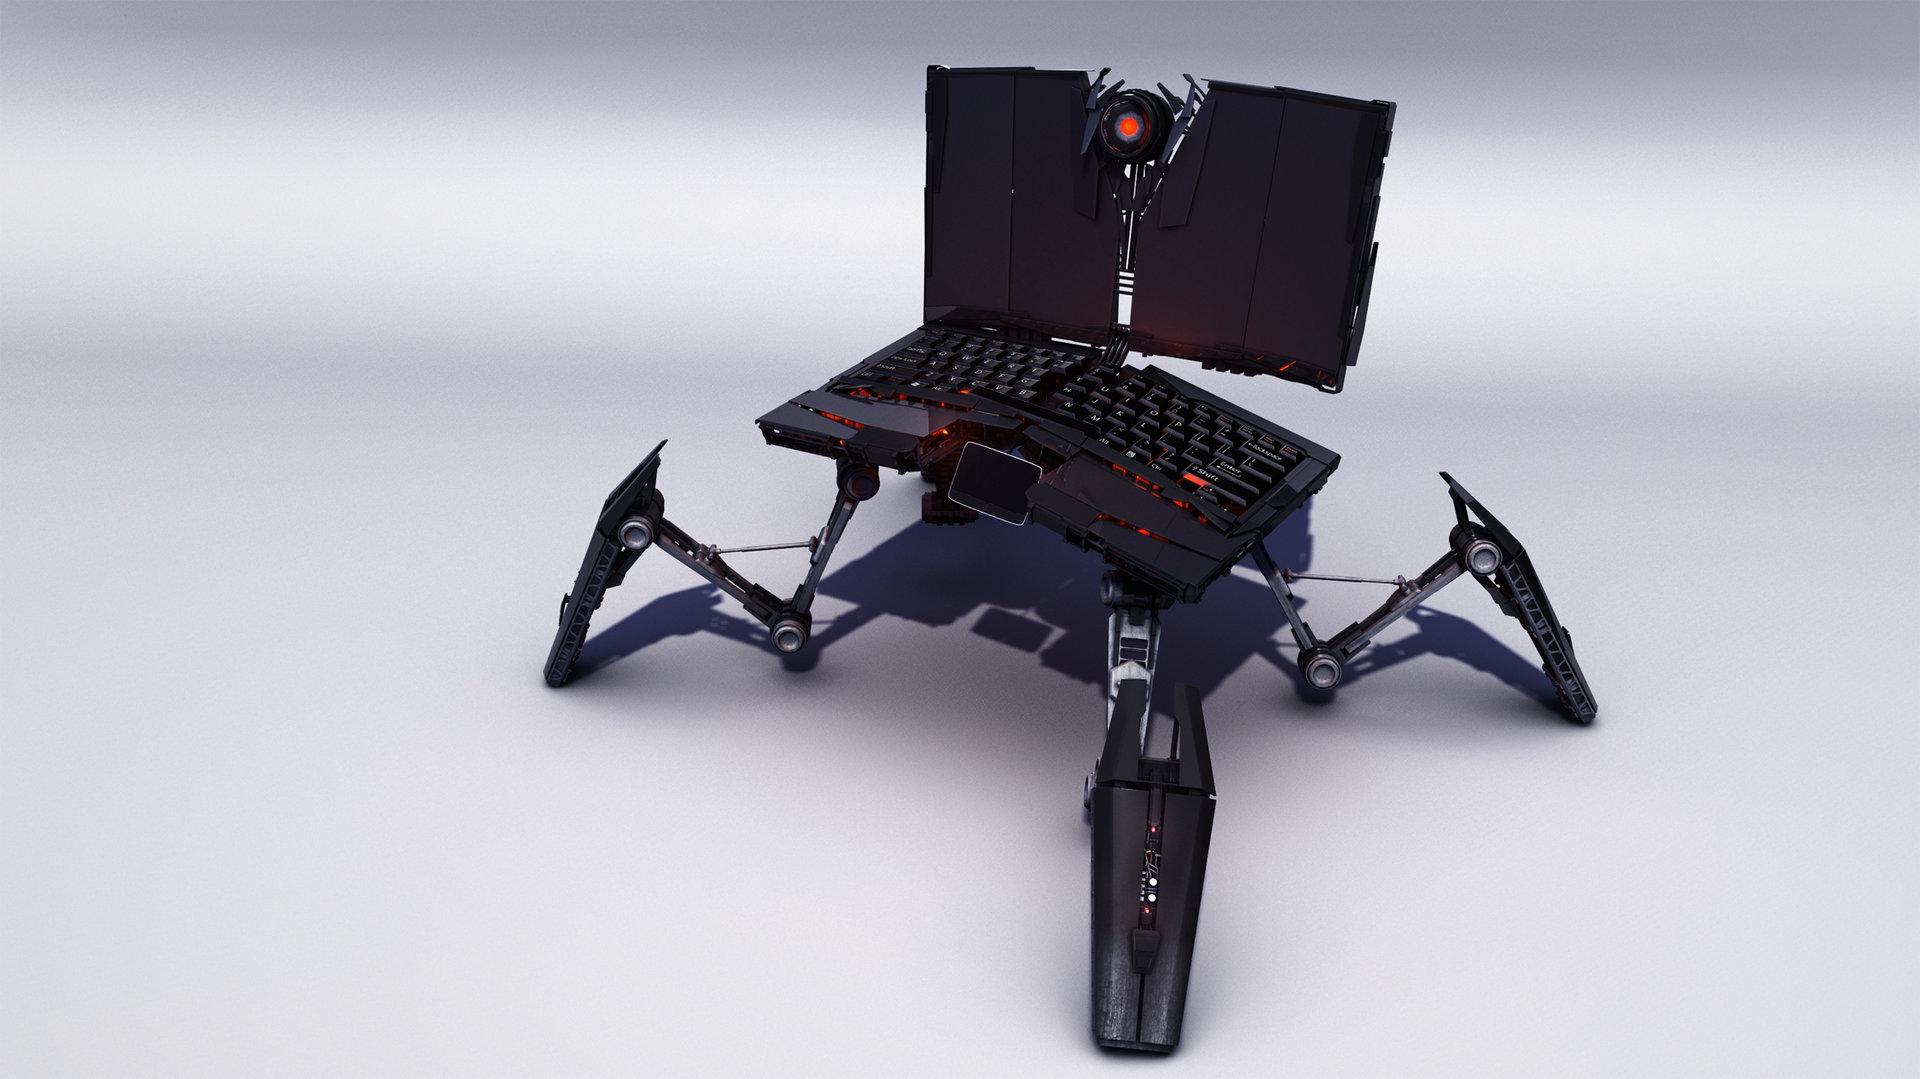 Jonas prunskus laptop still shot